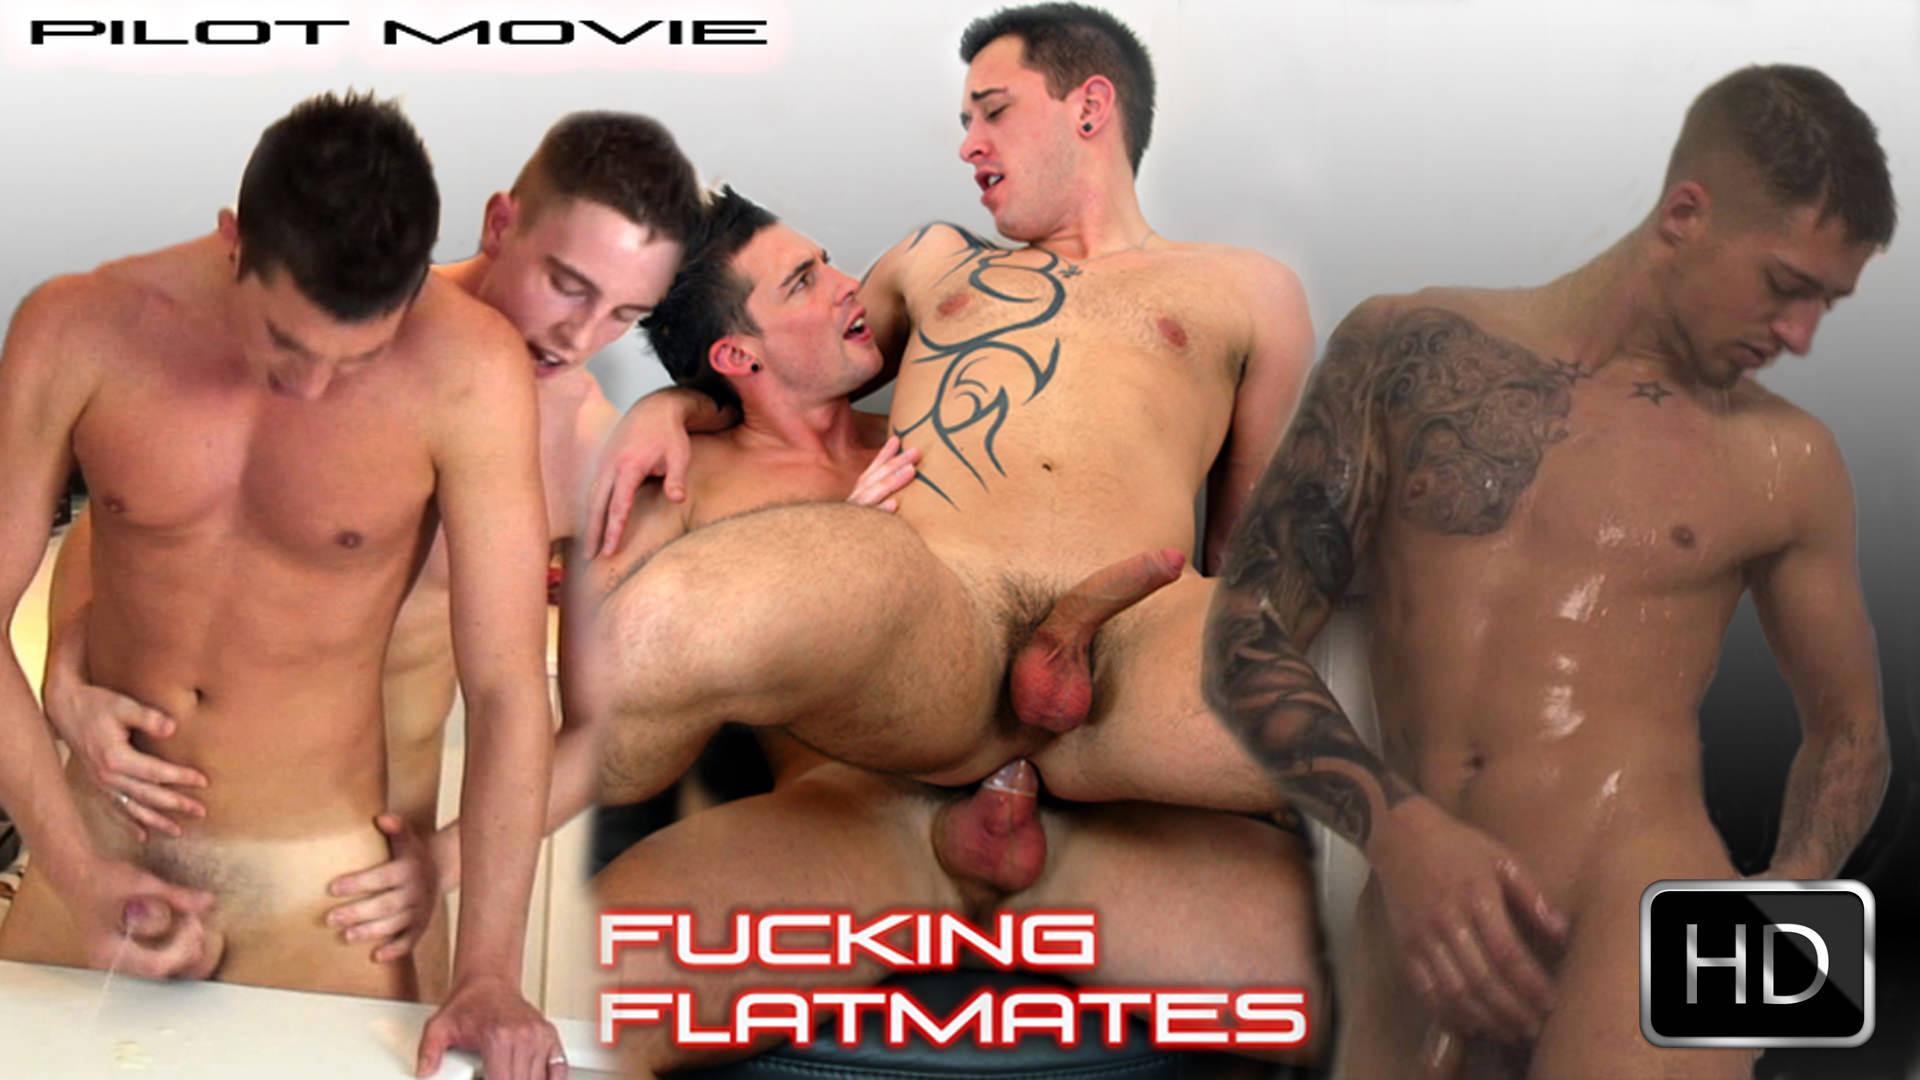 Fucking Flat-mates